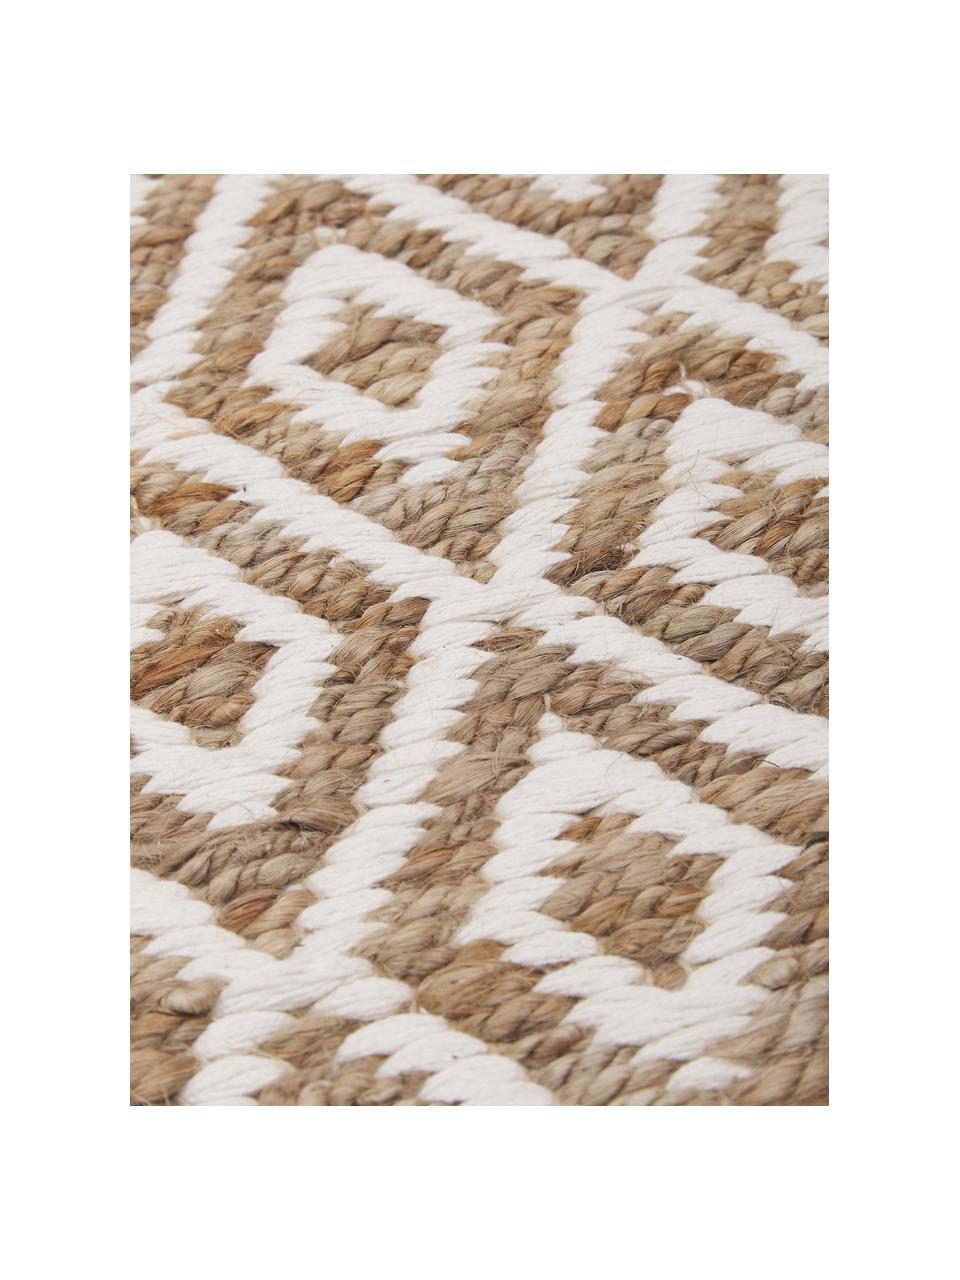 Handgefertigter Jute-Teppich Ramos, 100% Jute, Beige, B 200 x L 300 cm (Größe L)